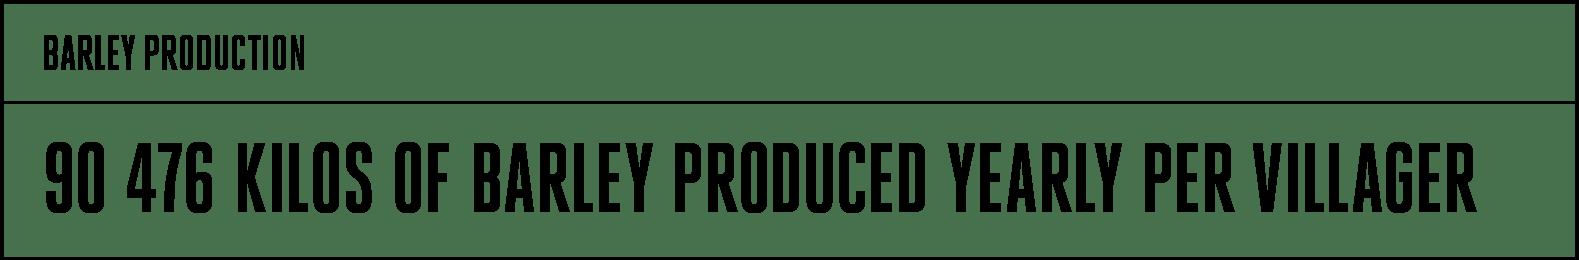 Koskenkorva barley production infobox